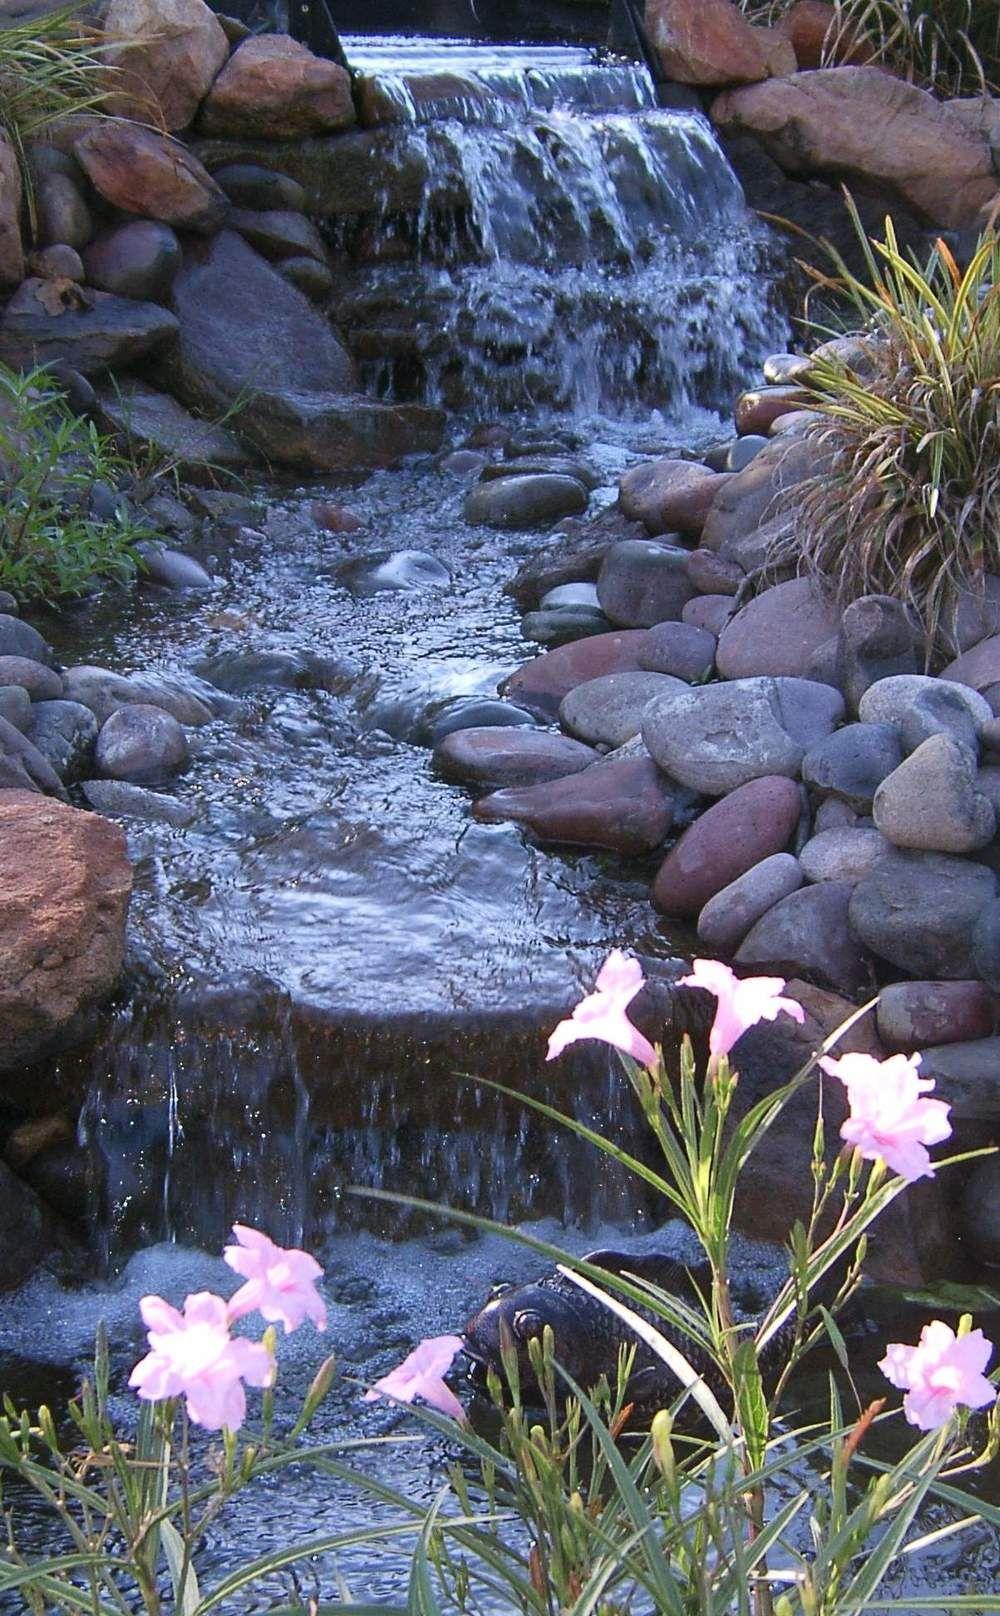 Bassin Jardin Moderne Unique Images Pinspiration 90 Stylish Backyard & Garden Waterfalls